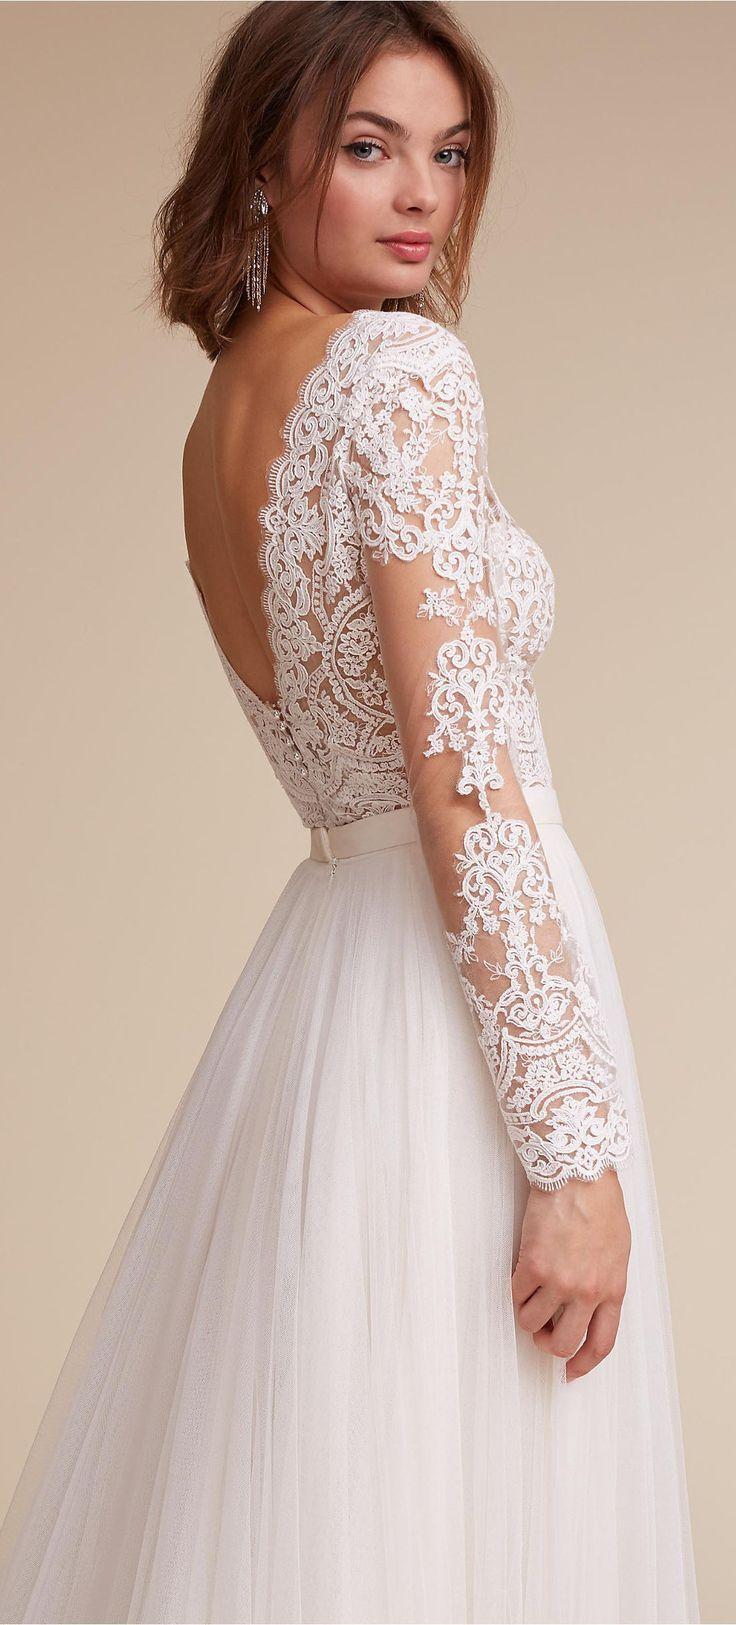 Longsleeve lace wedding dress by BHLDN ウェディングドレス, ドレス